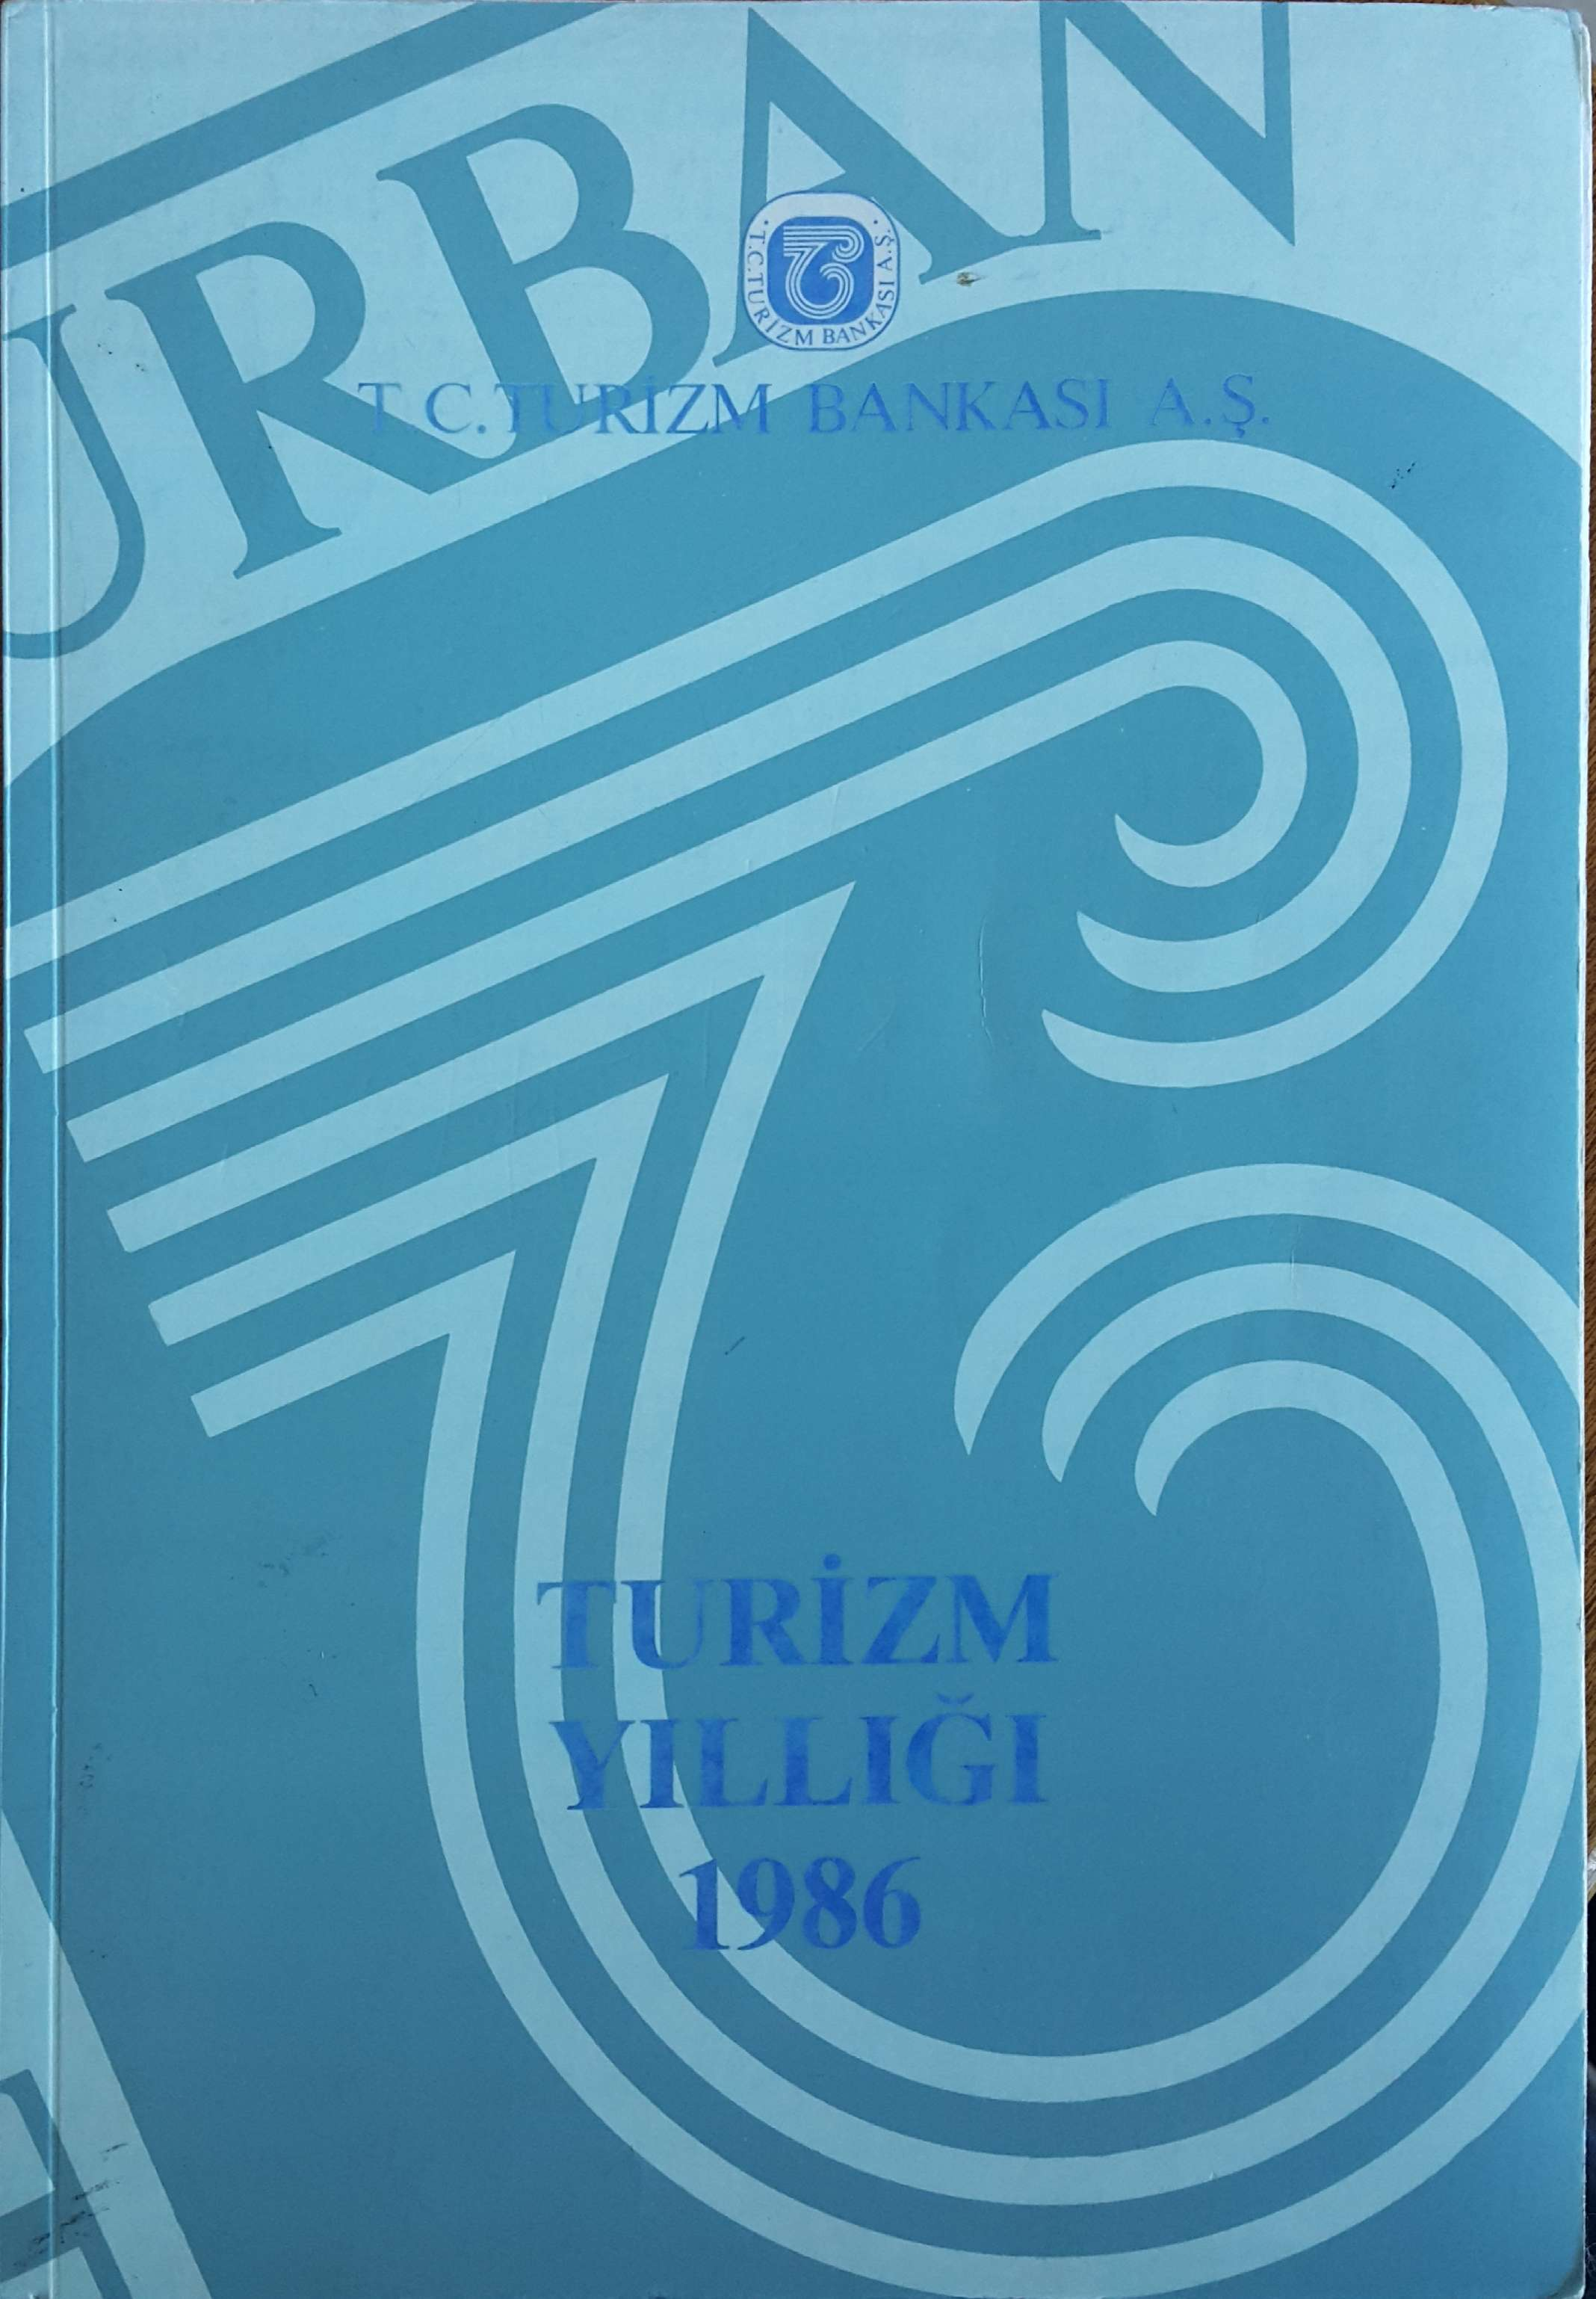 Turizm Yıllığı 1986 Kitap Kapağı